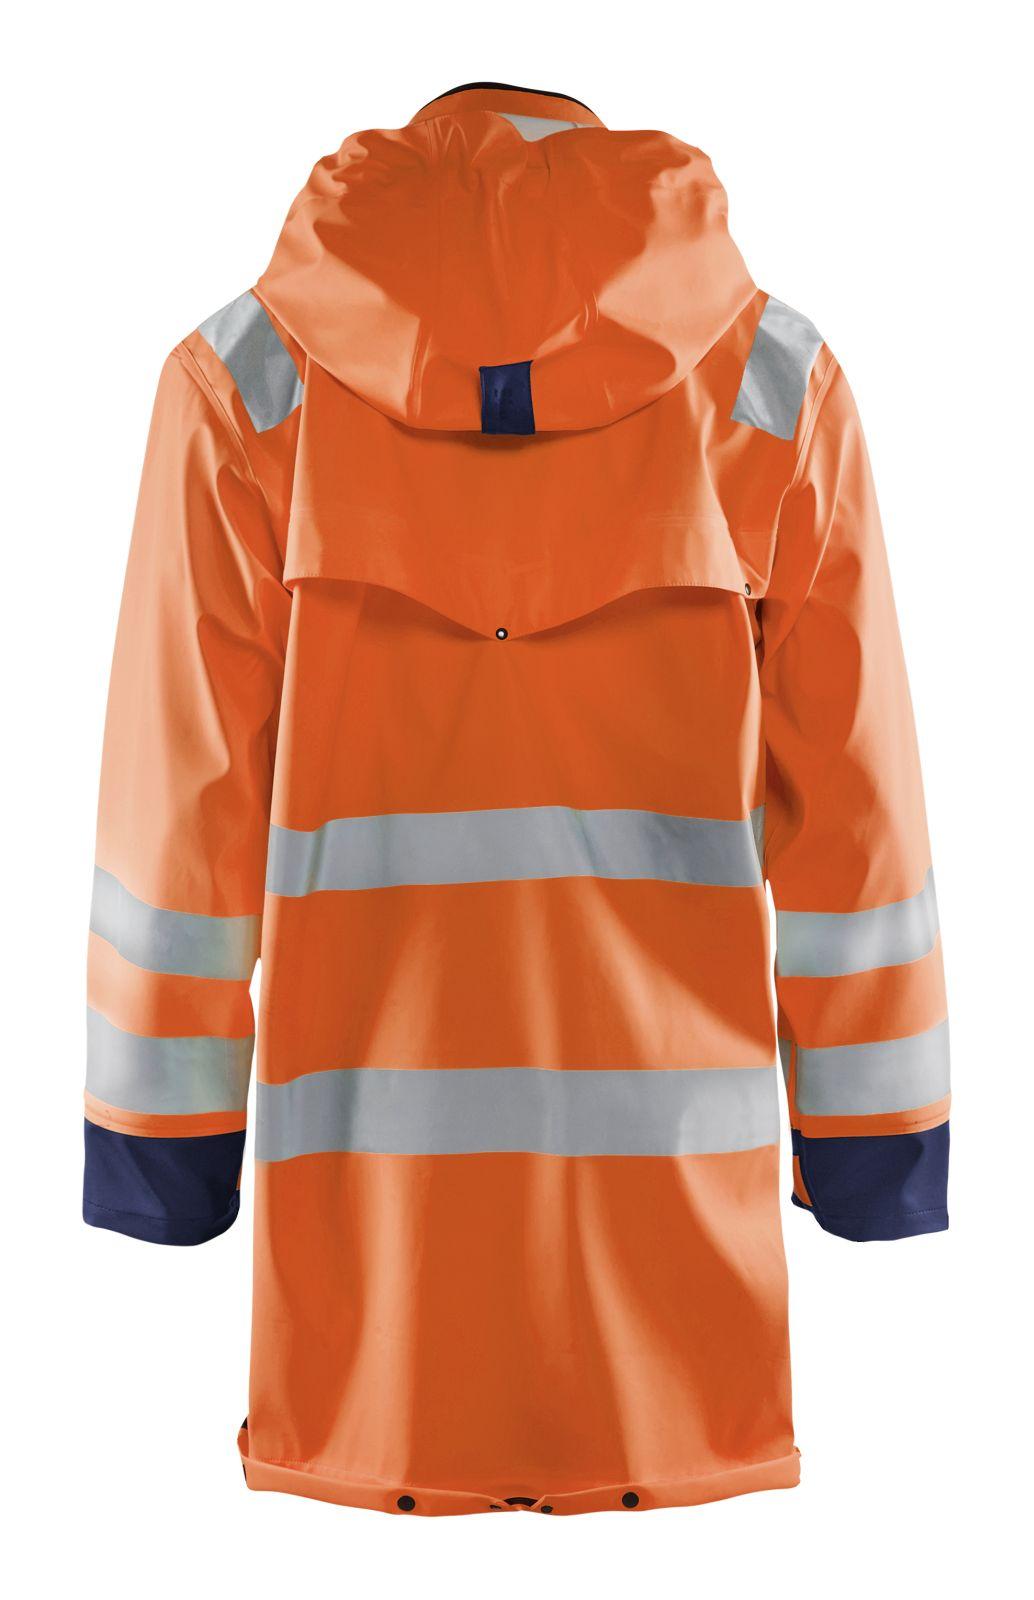 Blaklader Regenjassen 43062003 High Vis oranje-marineblauw(5389)